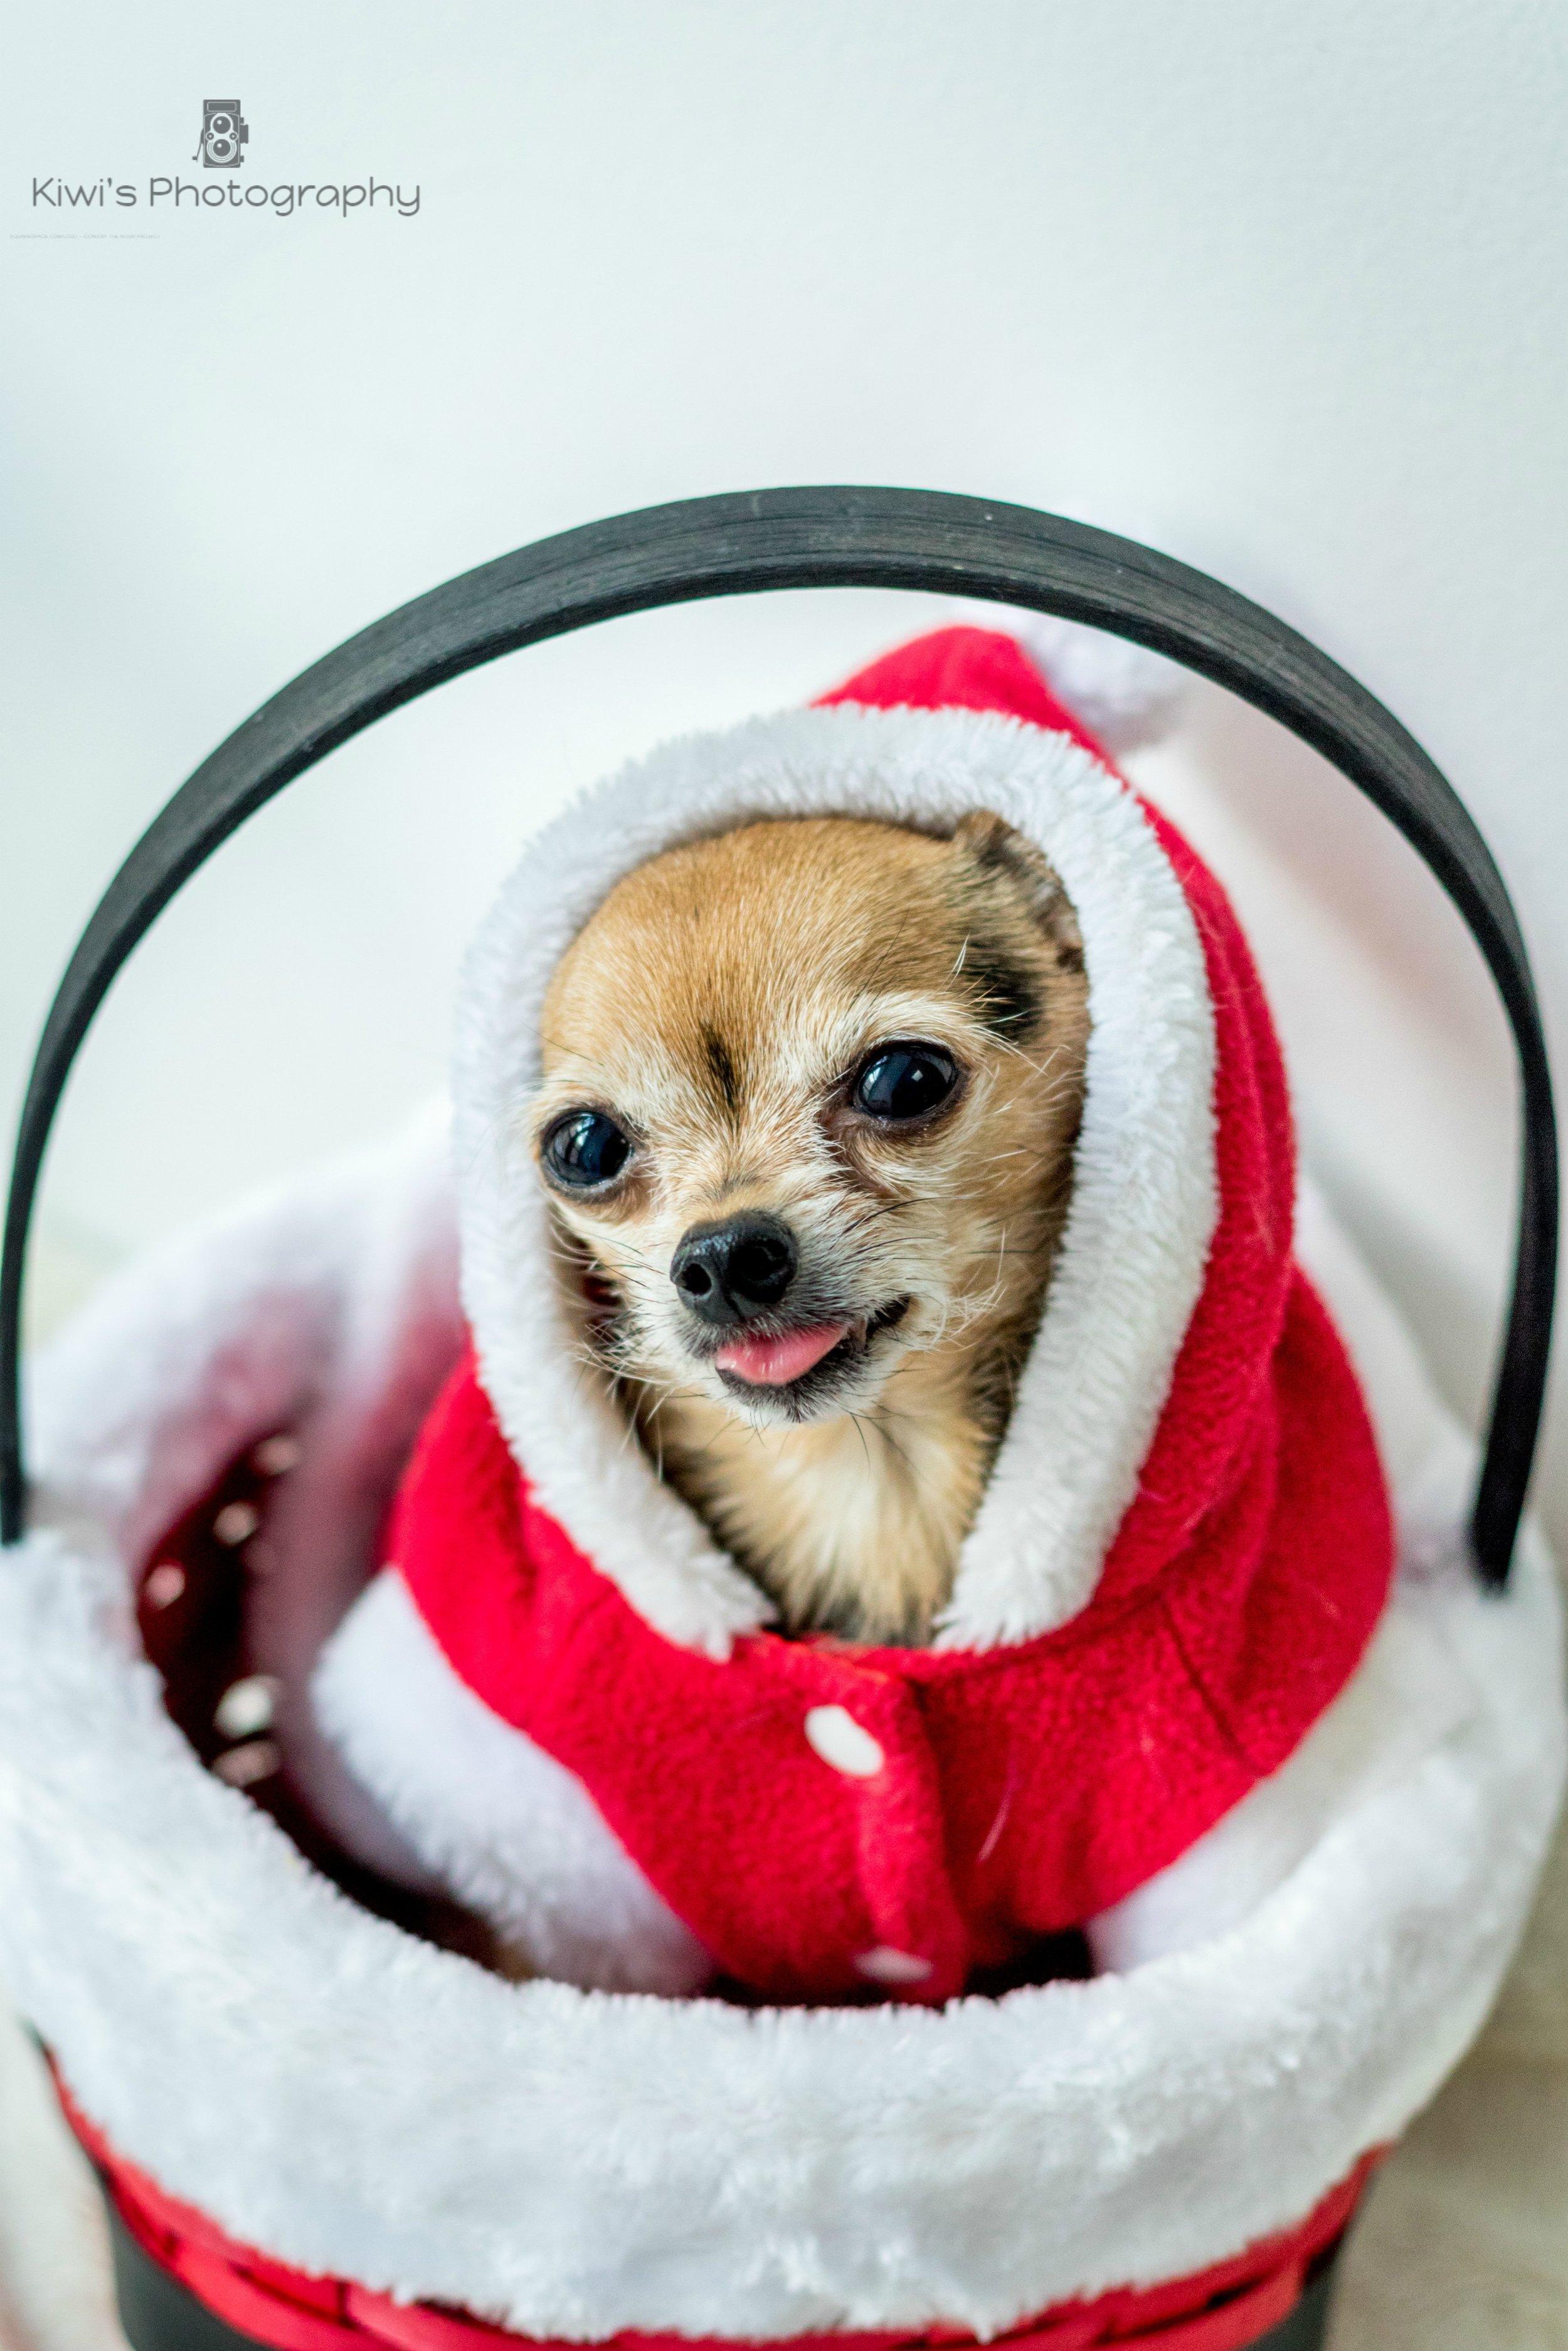 Chihuahua yorkie mix, Christmas costume dog, chorkie in Ottawa